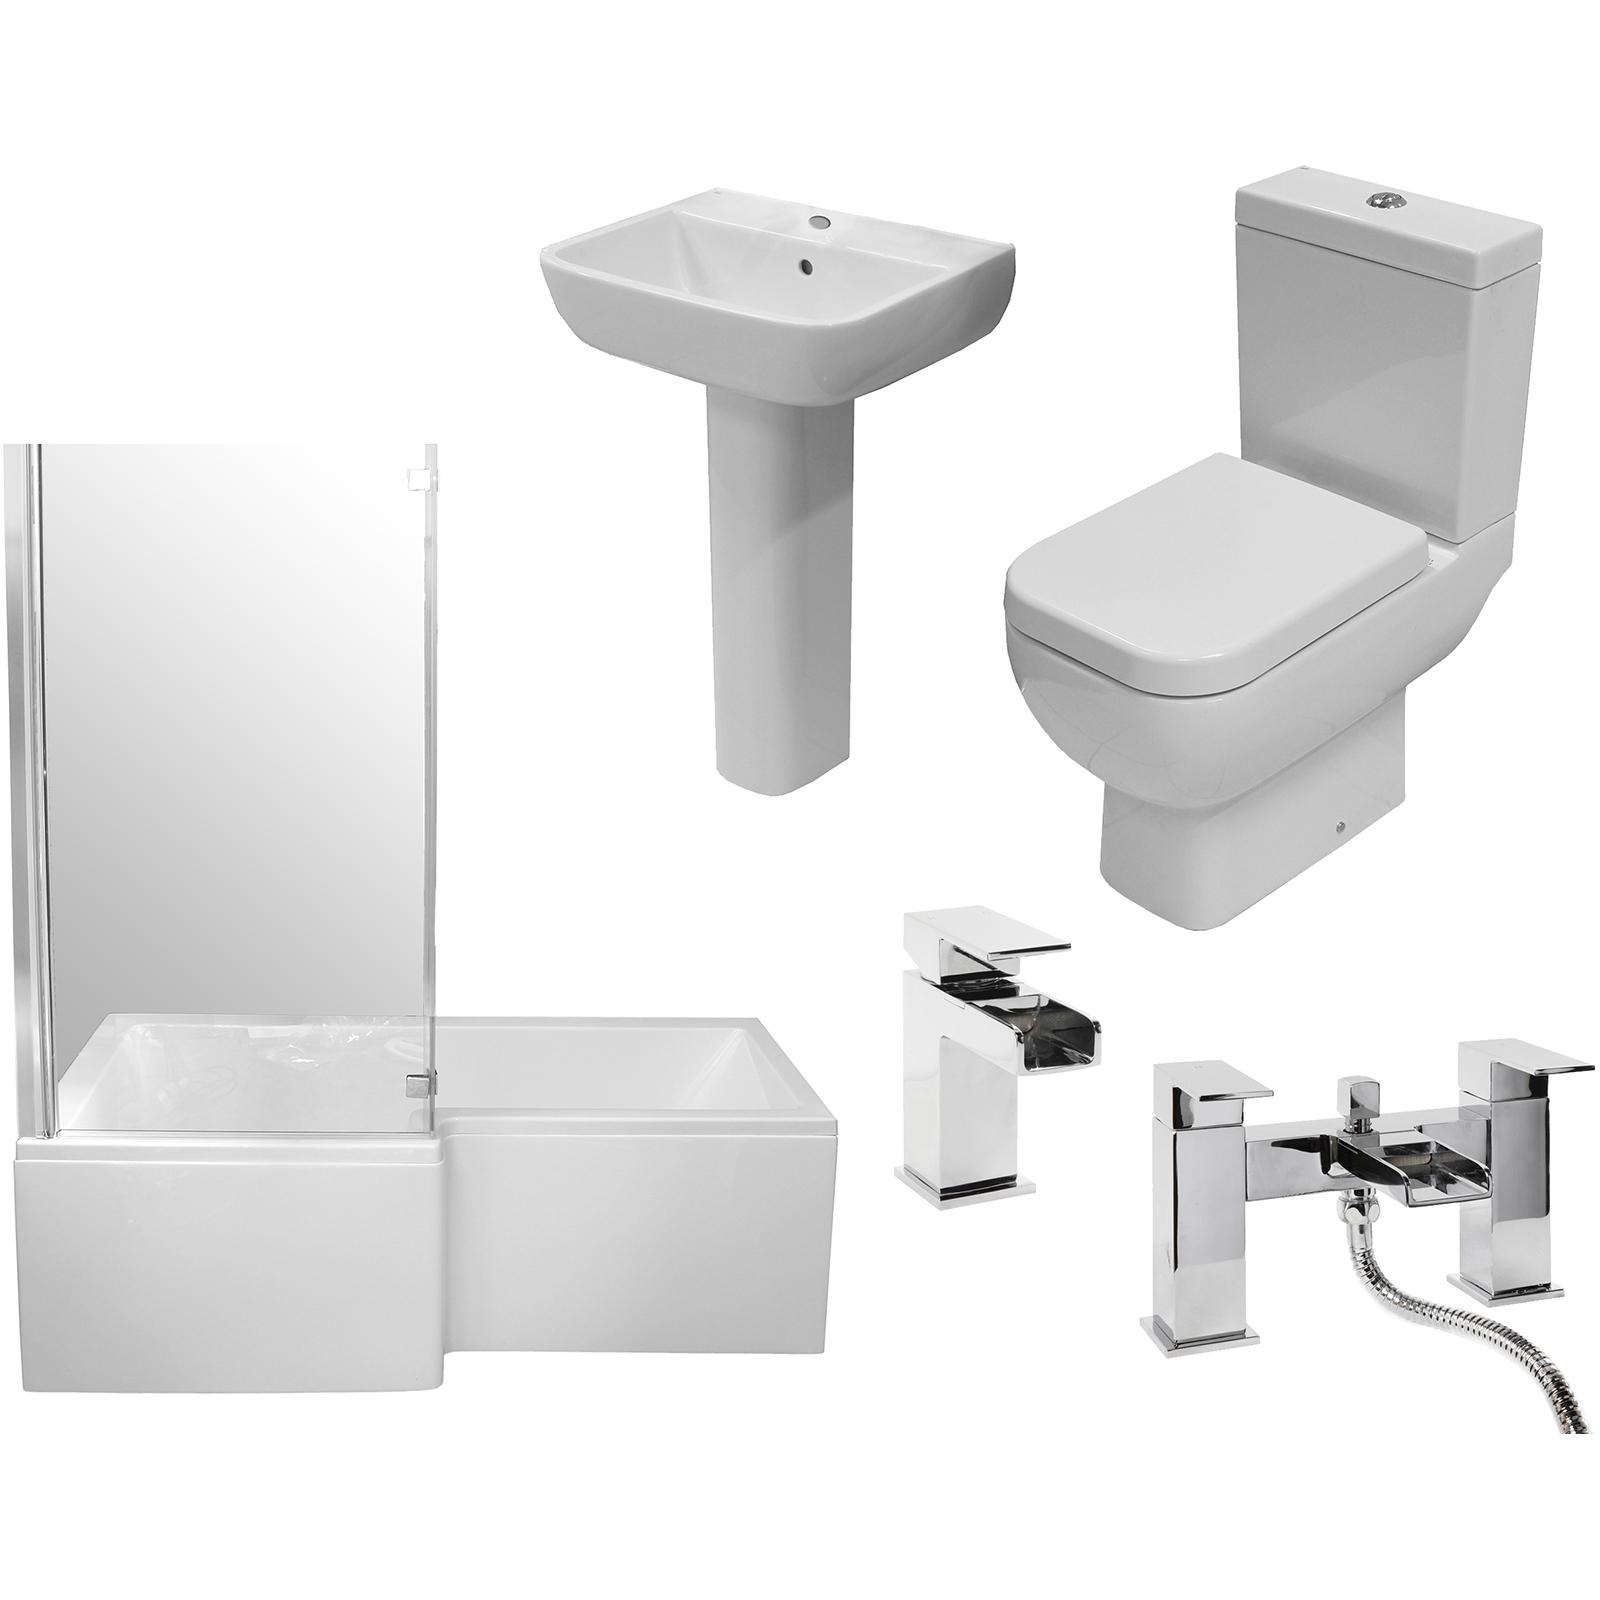 Allbits Square Shower Bath Bathroom Suite LH £647.97 at Allbits ...